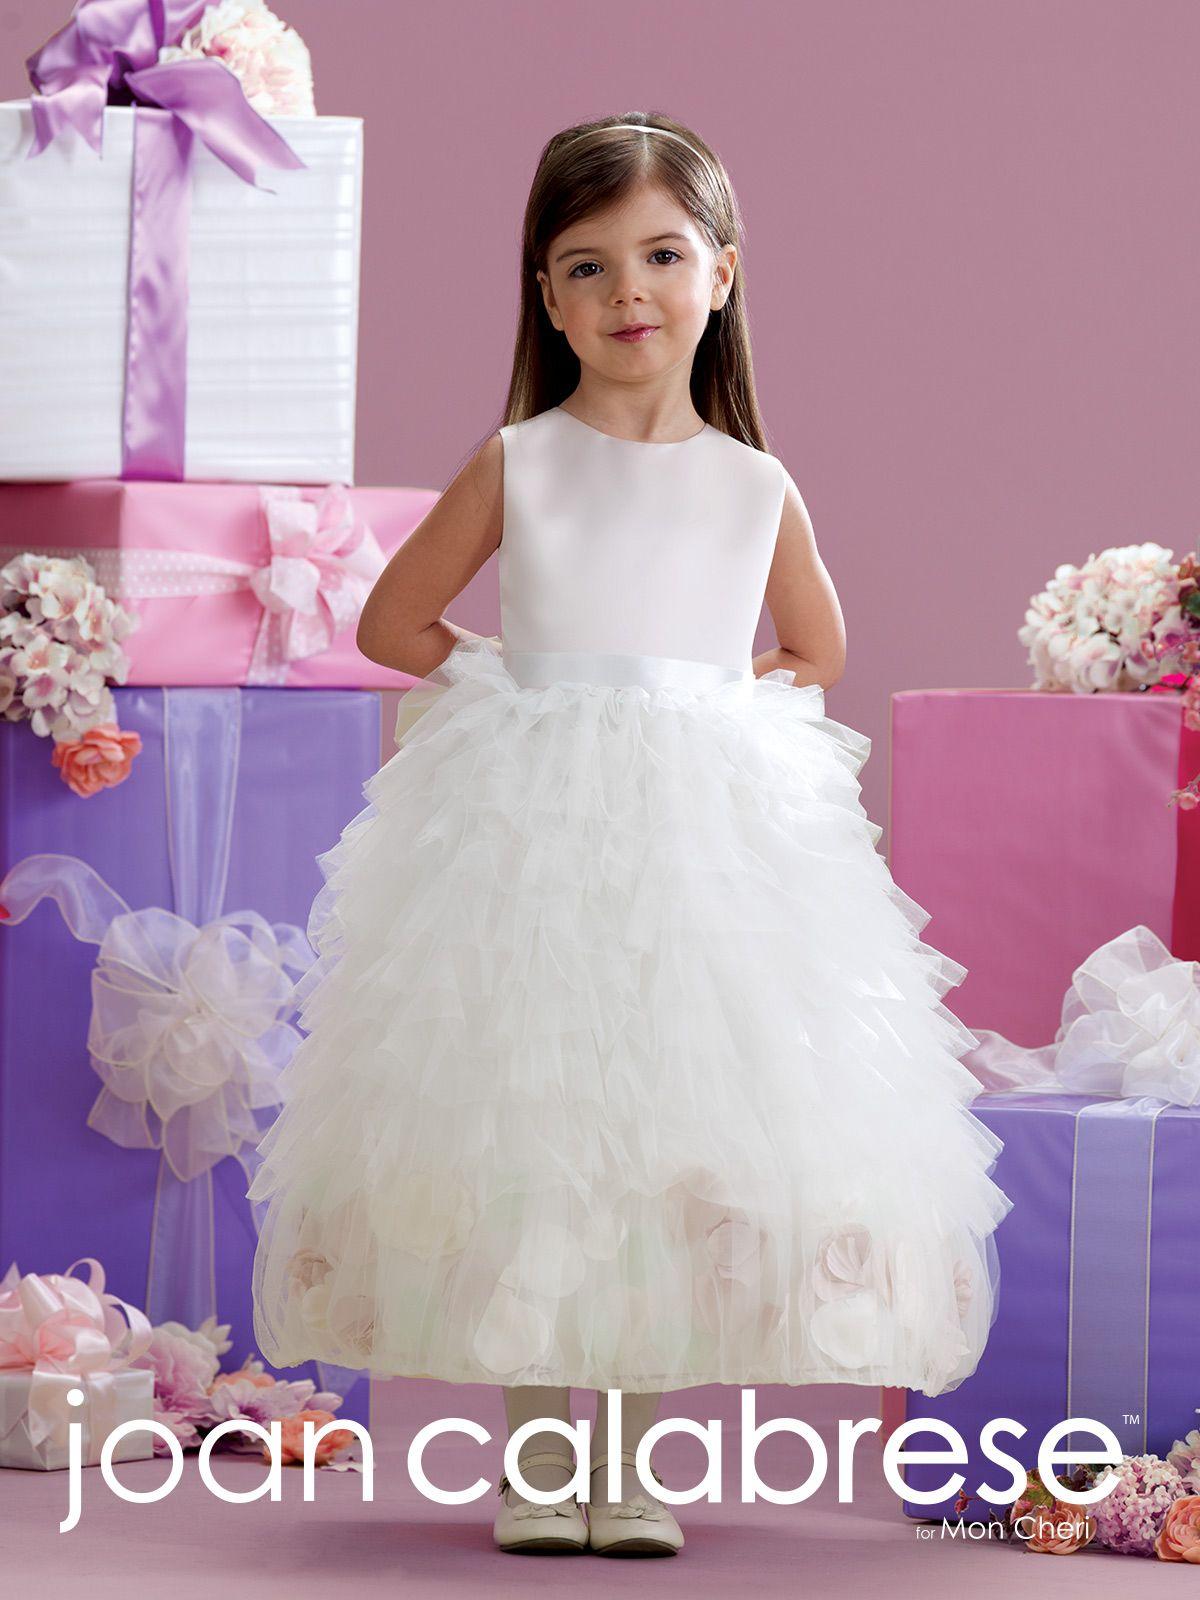 Joan calabrese flower girl dresses wedding ideas pinterest